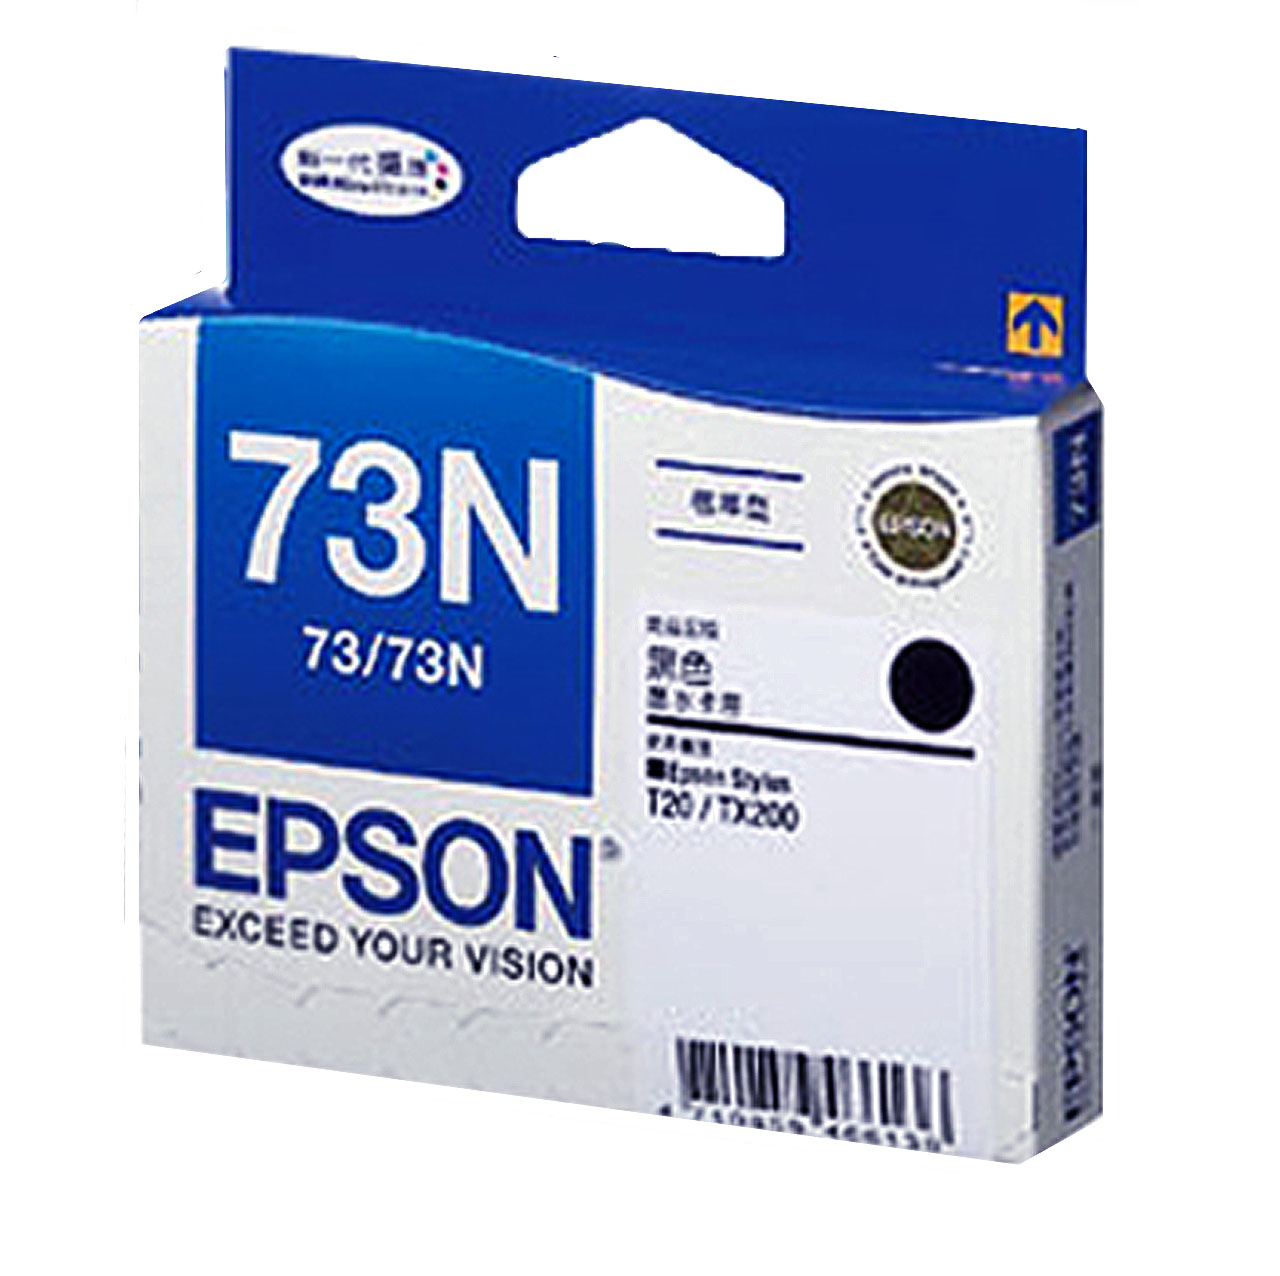 T105150 EPSON 原廠 黑色墨水匣-新一代魔珠墨水 C79/C90/C110/CX3900/CX4900/CX5500/CX5505/CX5900/CX6900F/CX7300/T20